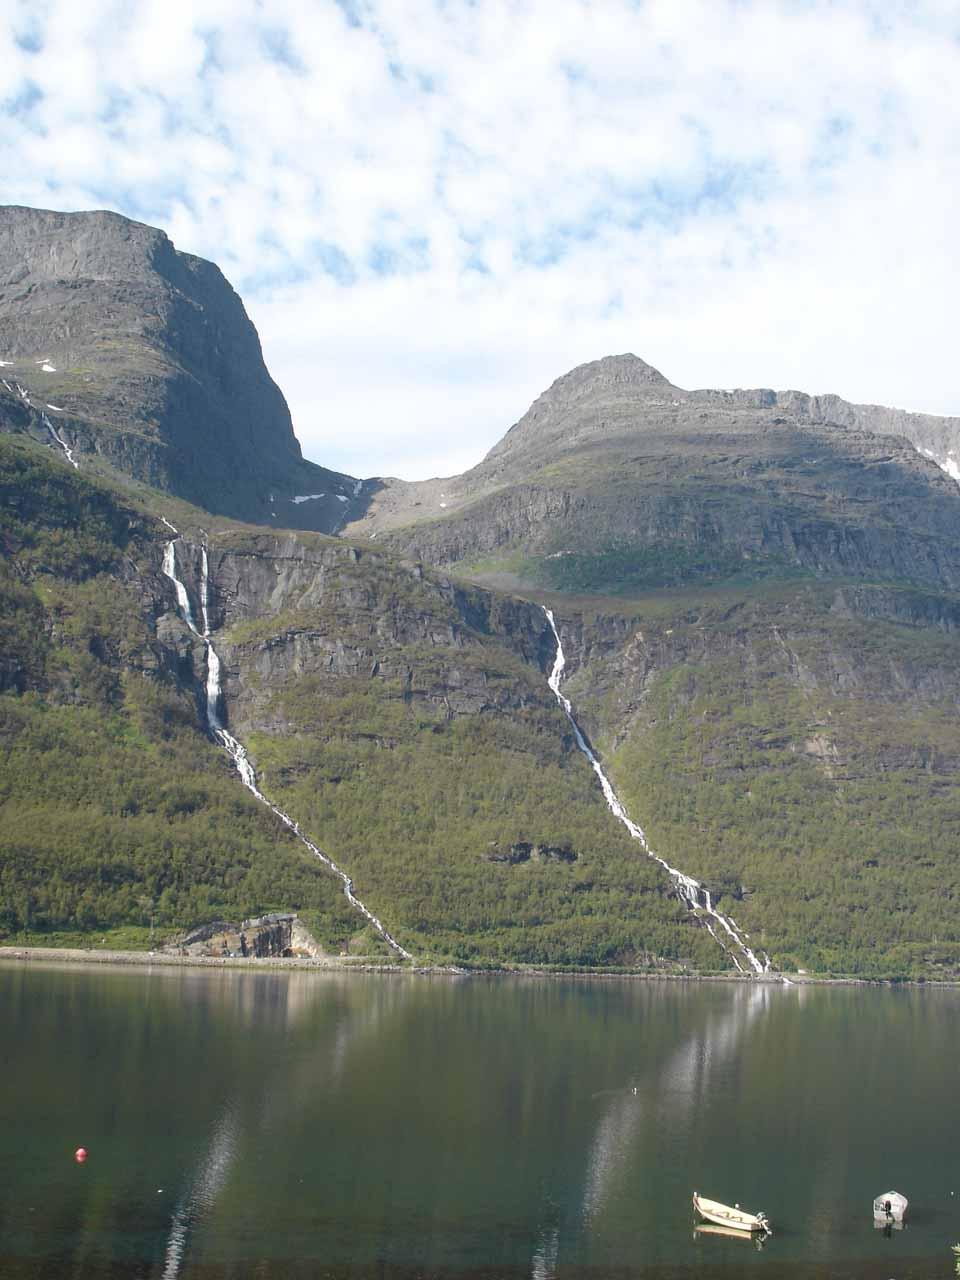 'Ytre Isfossen' (right) and 'Indre Isfossen' (left) seen across Kåfjorden